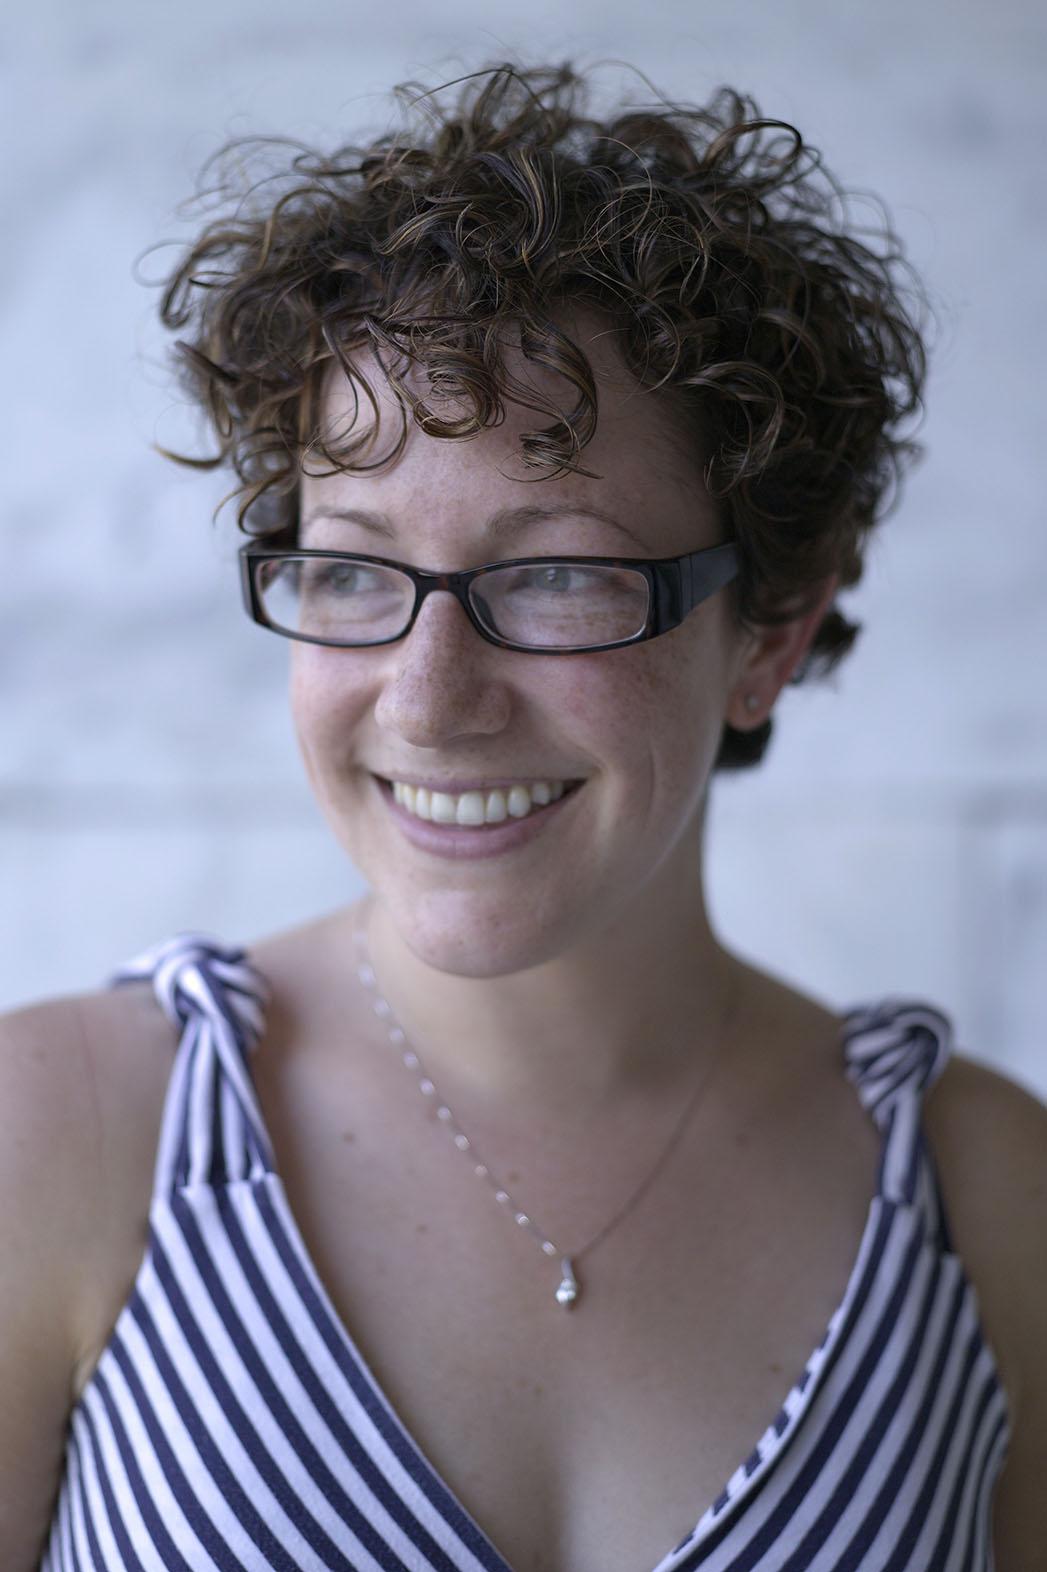 Nicole Perlman Headshot - P 2014